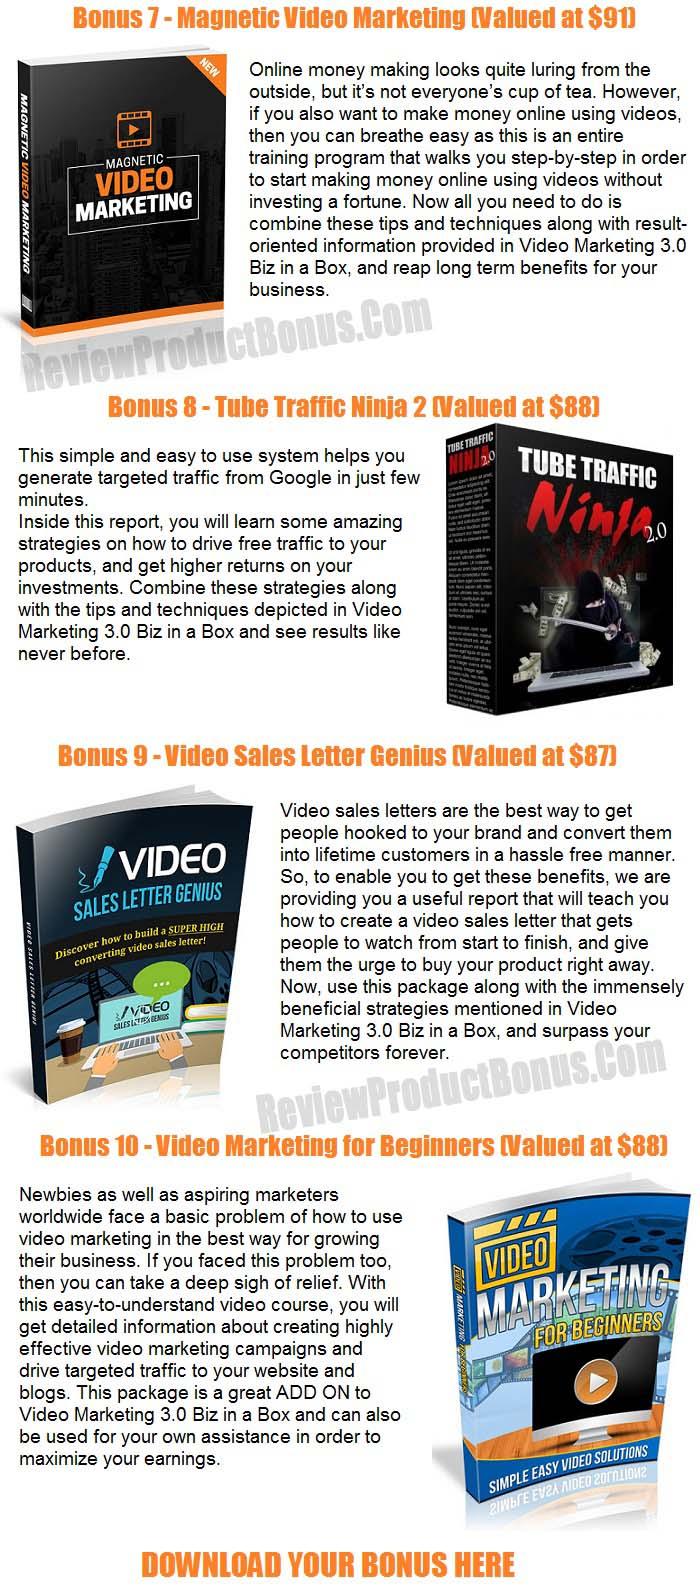 Video Marketing 3.0 Bonuses